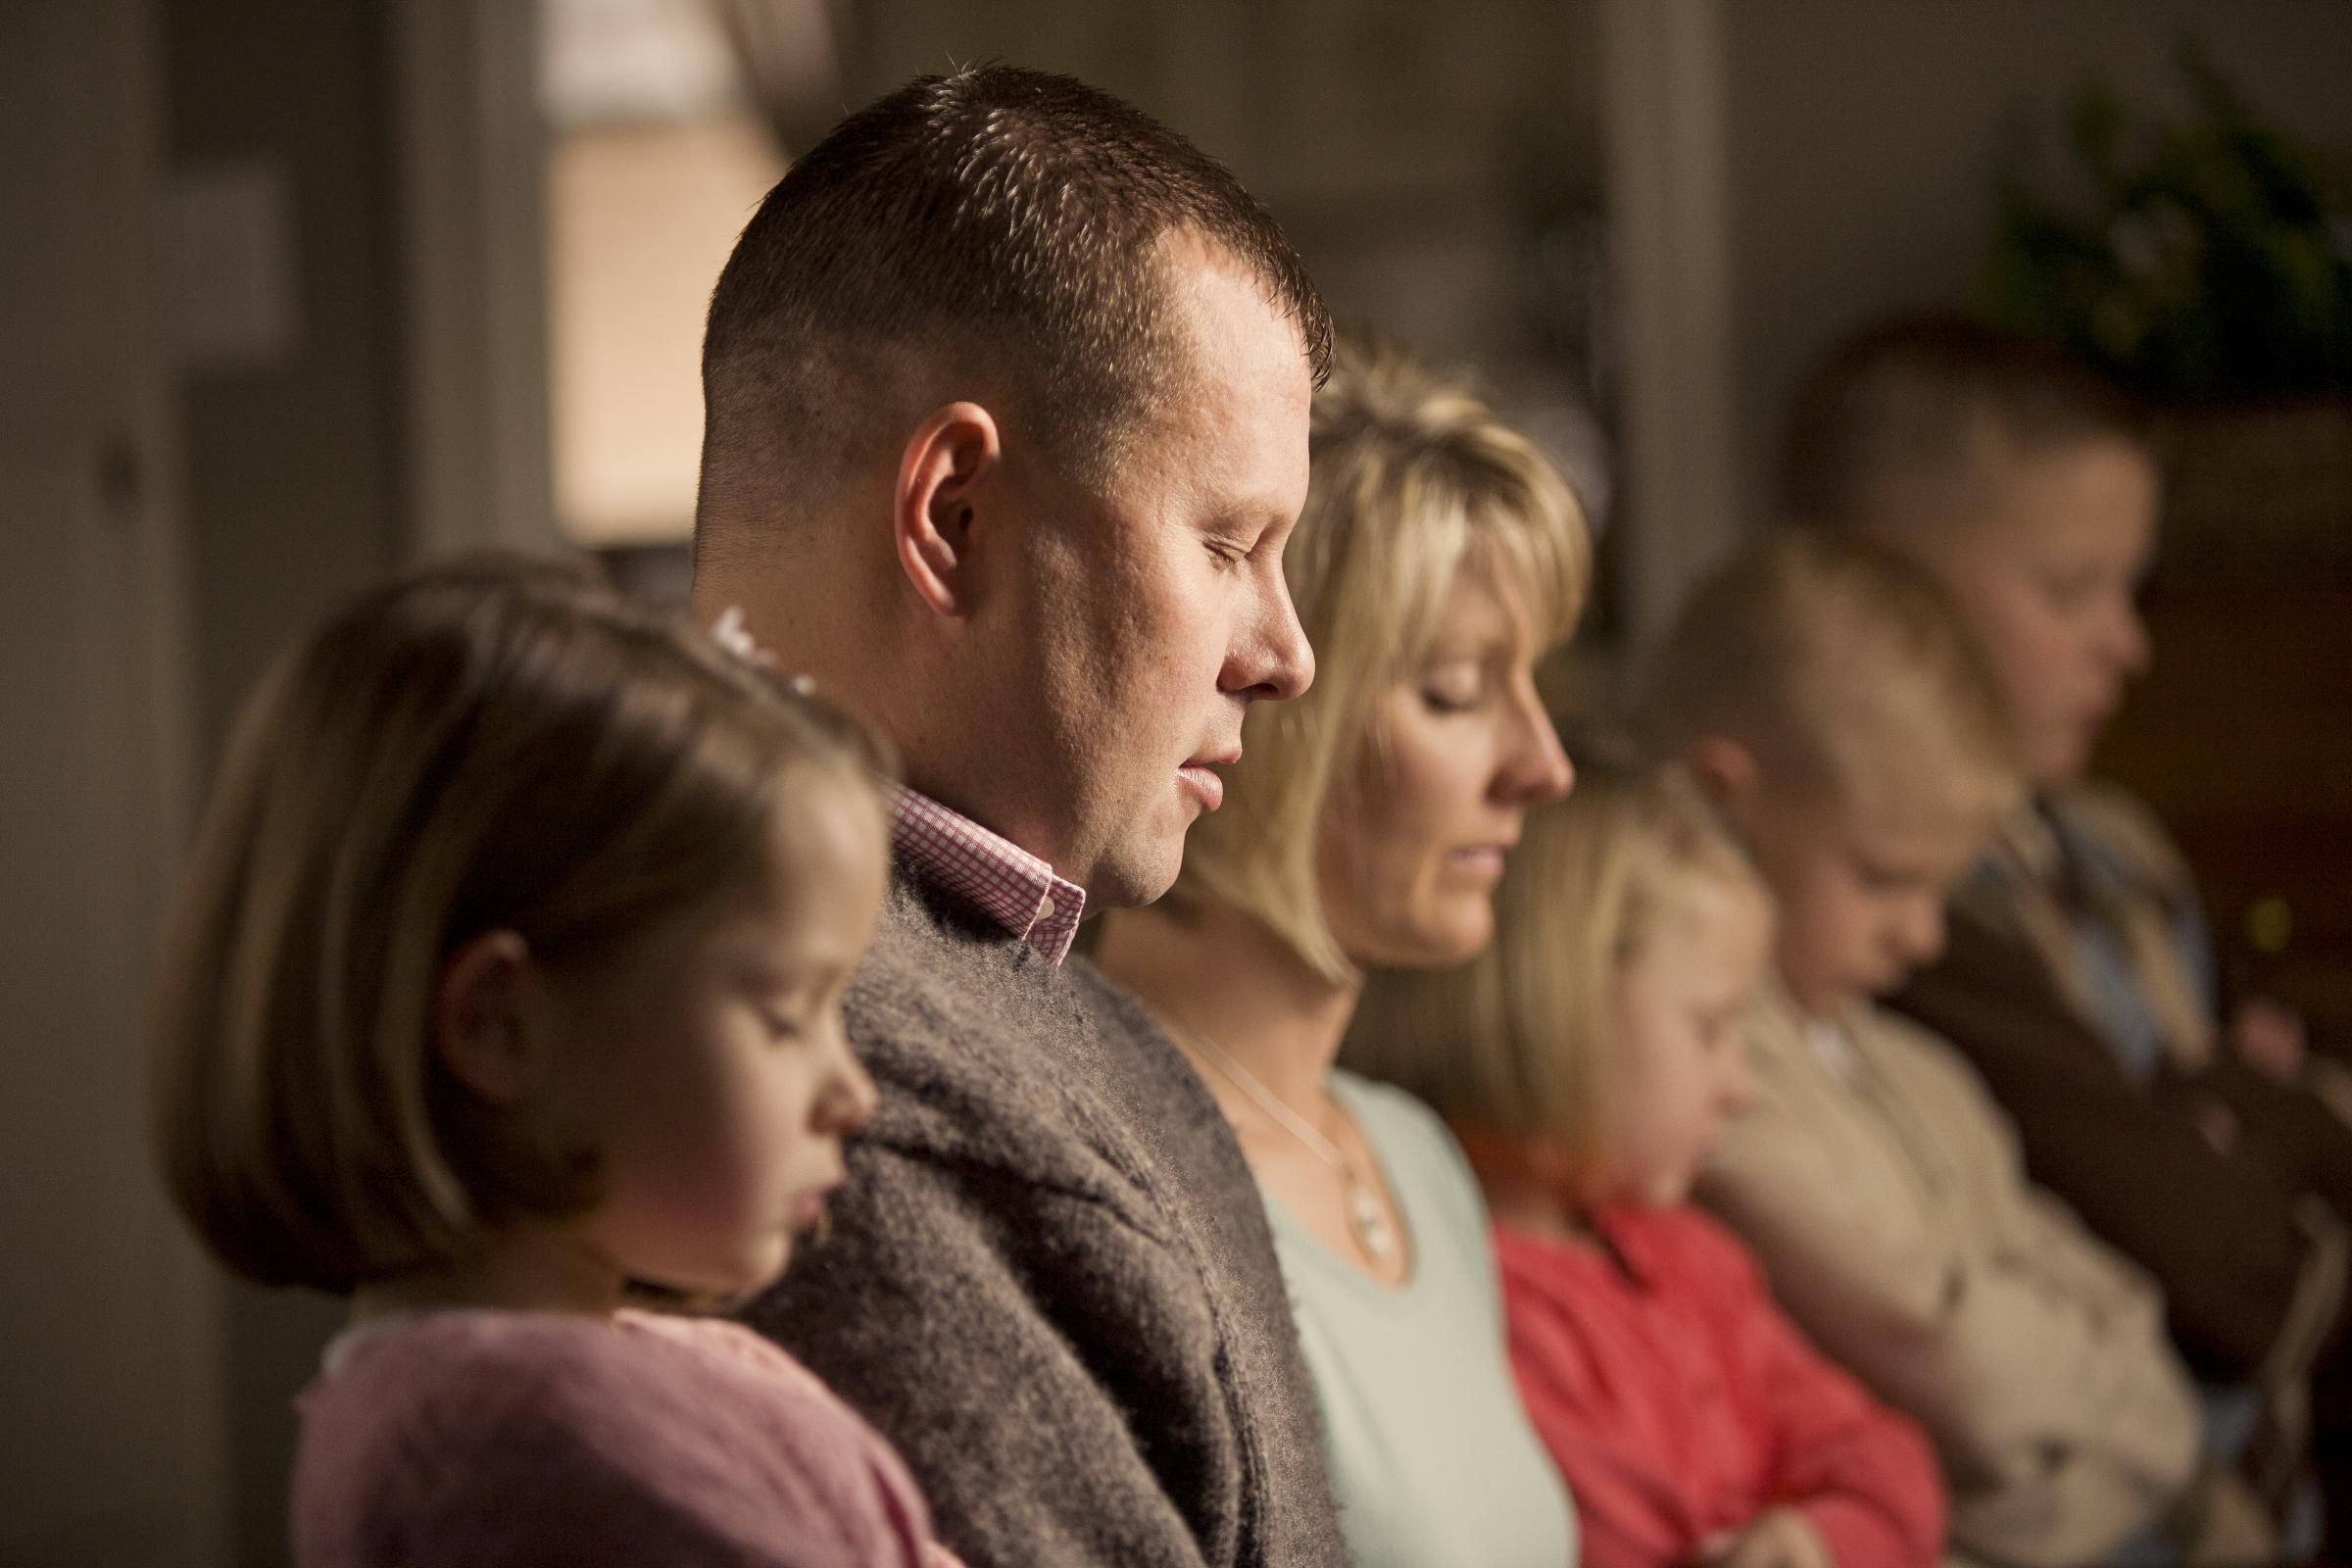 https://media.ldscdn.org/images/media-library/prayer/family-prayer-790193-wallpaper.jpg?download=true